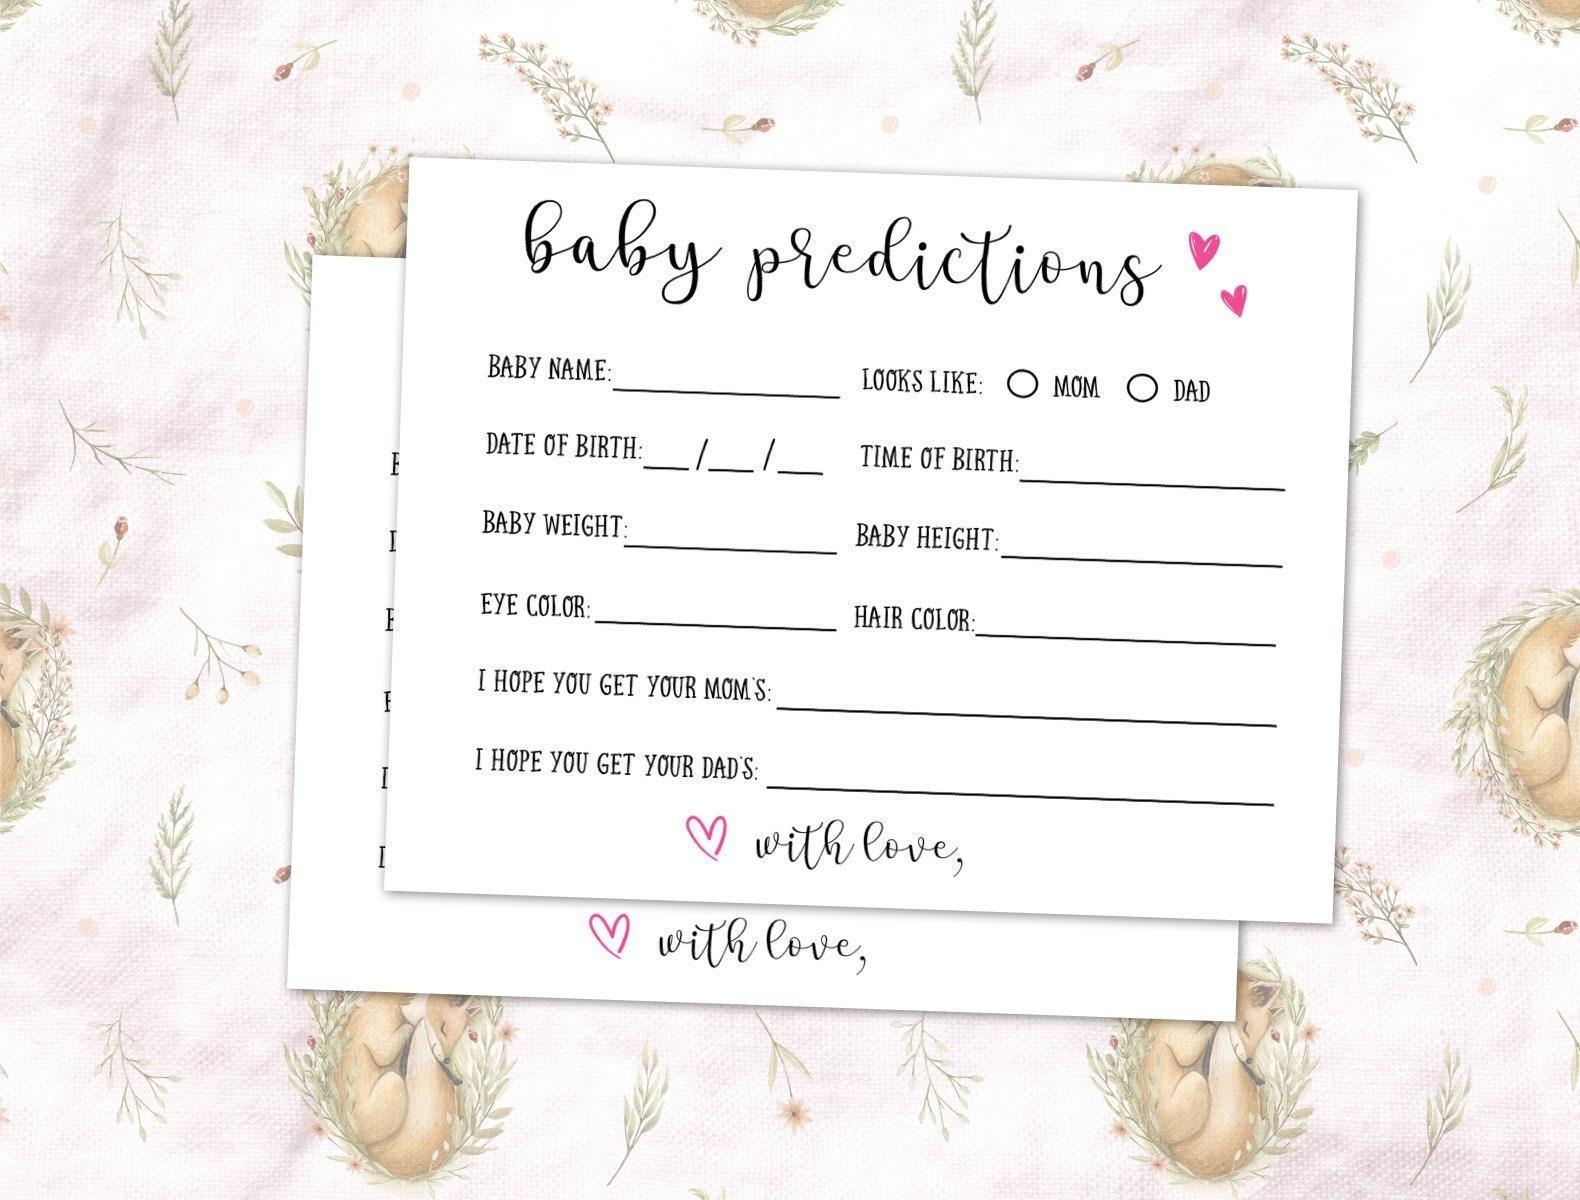 Baby Prediction Cards, Baby Predictions, Baby Prediction Download,  Printable, Baby Shower Games, Woodsy, Pink Baby Shower, DIY Digital PDF